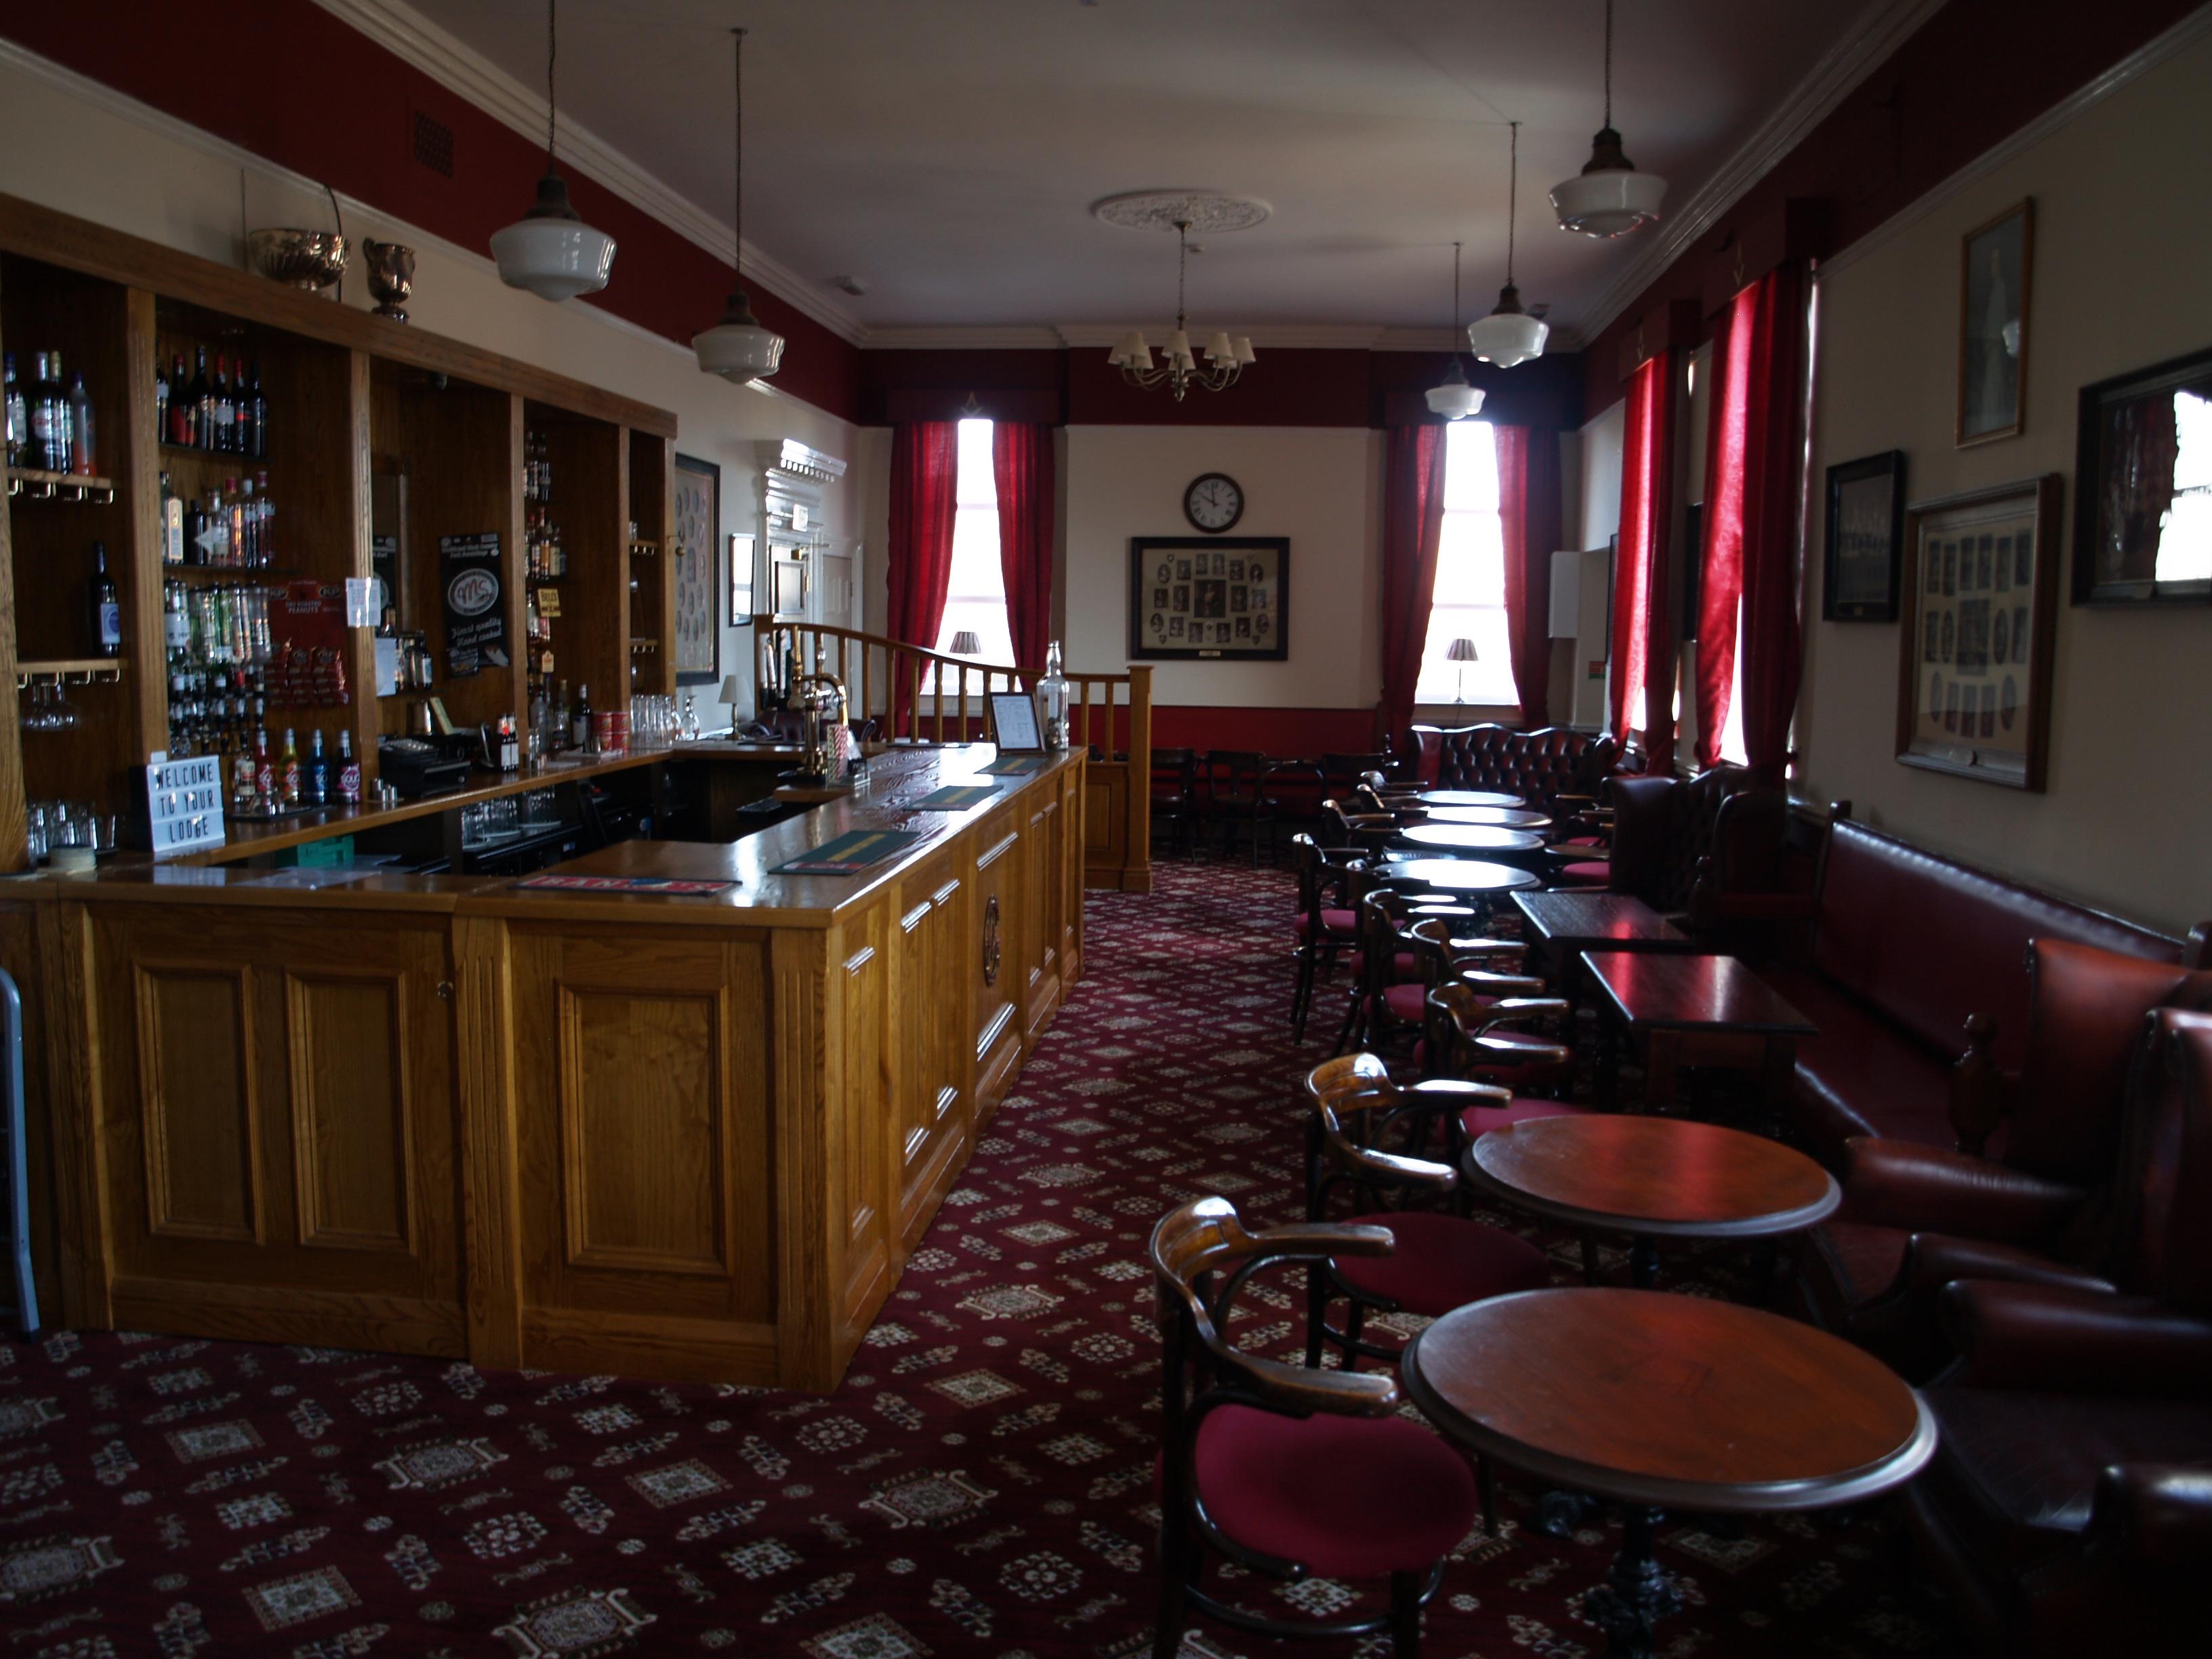 South Shields Masonic Hall 2